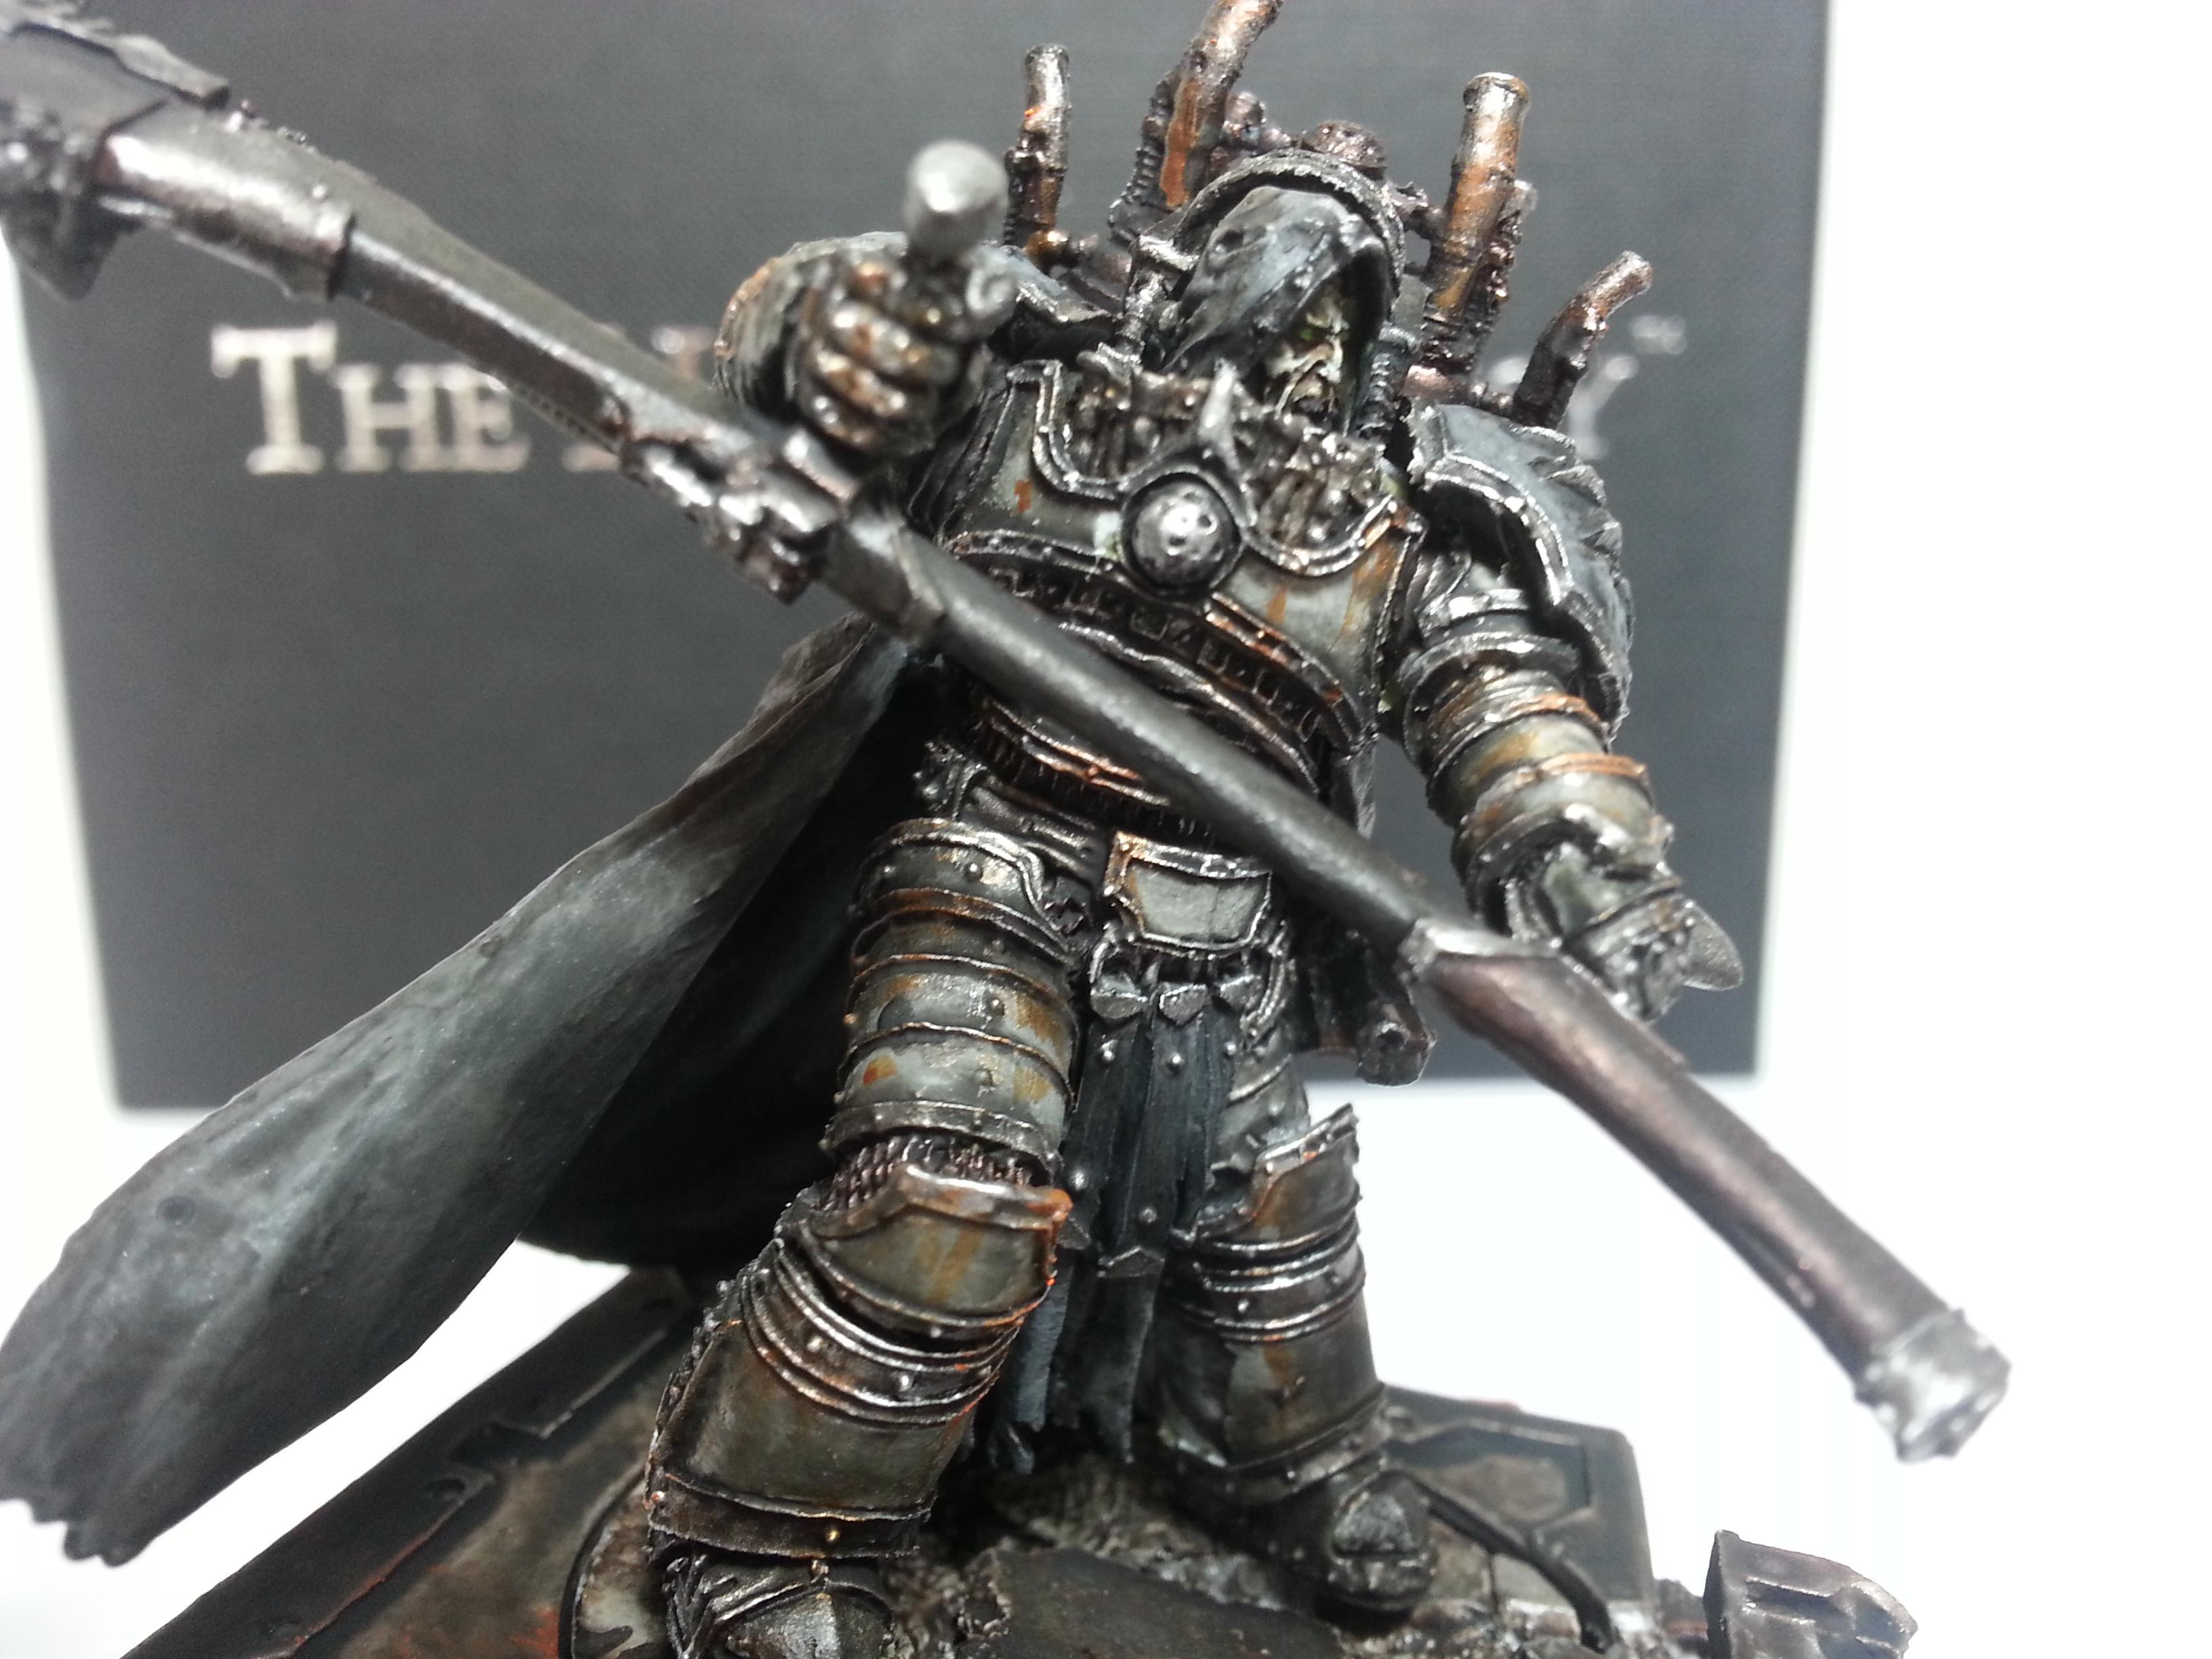 14th Legion, 30k, Death Guard, Forge World, Horus Heresy, Mortarion, Nurgle, Warhammer 40,000, Warhammer Fantasy